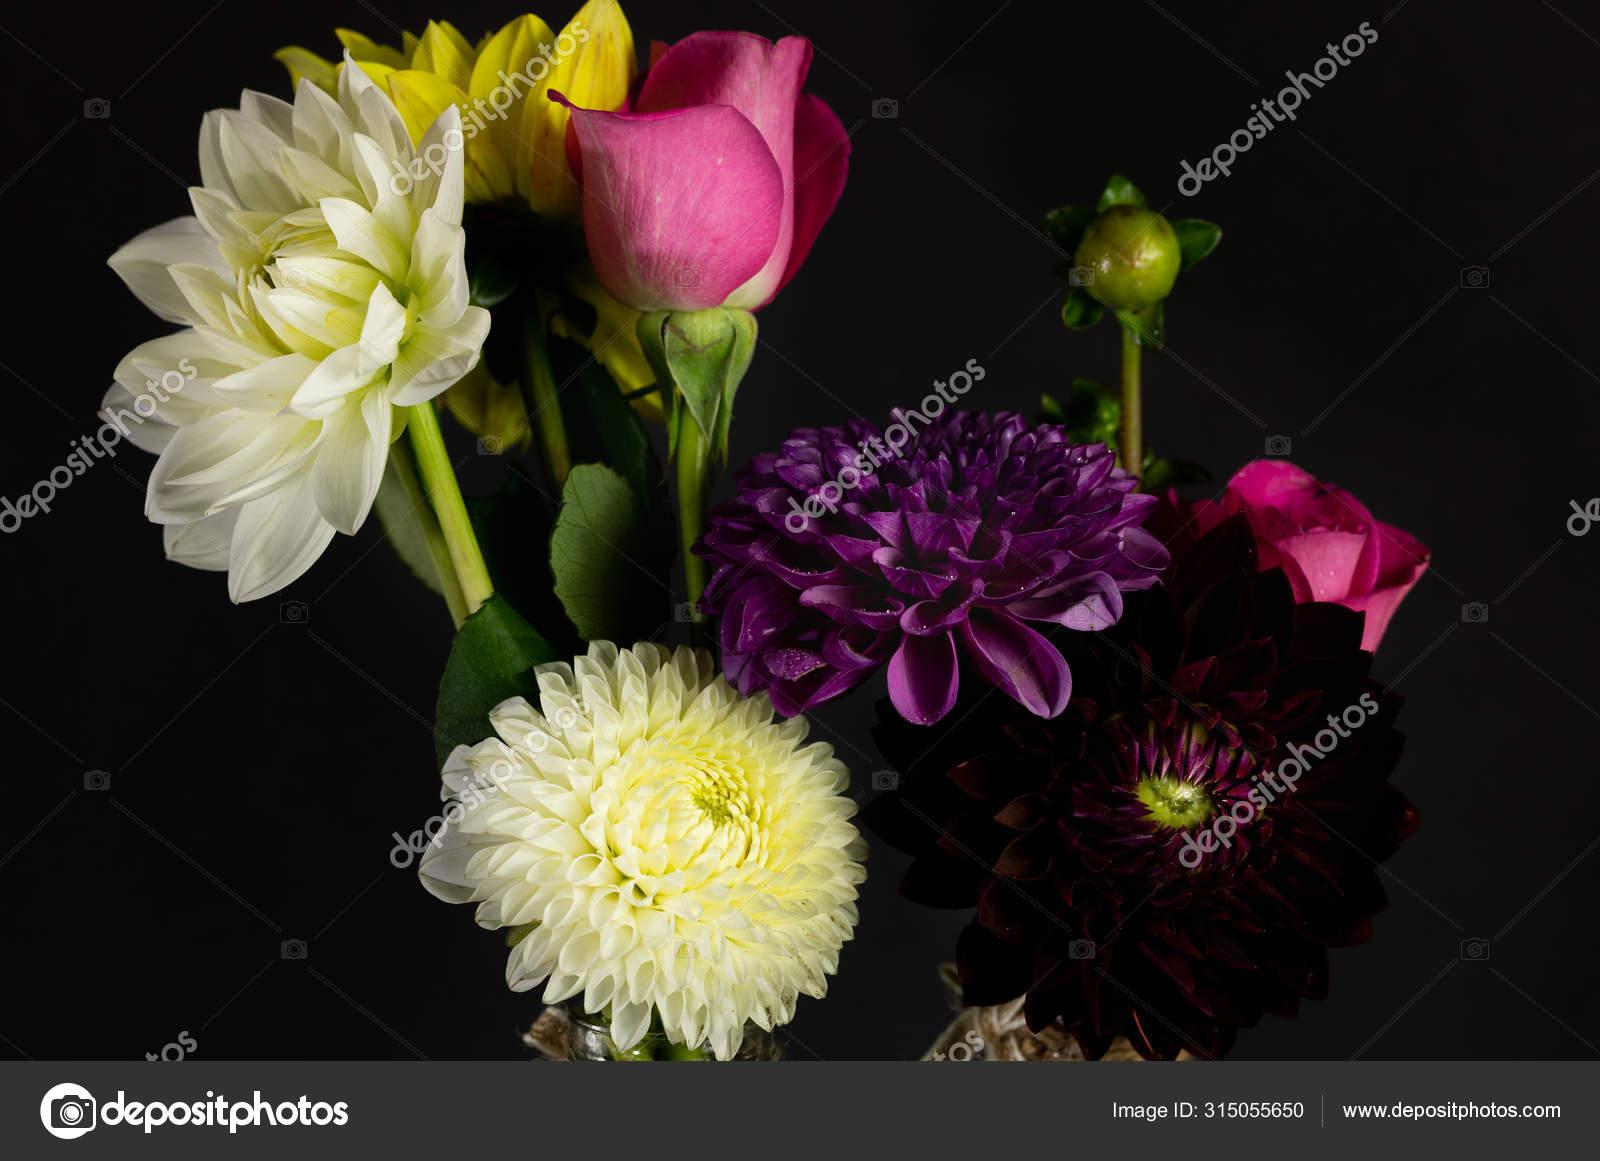 Dahlia Bouquet Single Flower Daisy Family Flower Head Stock Photo C Sarenac77 315055650